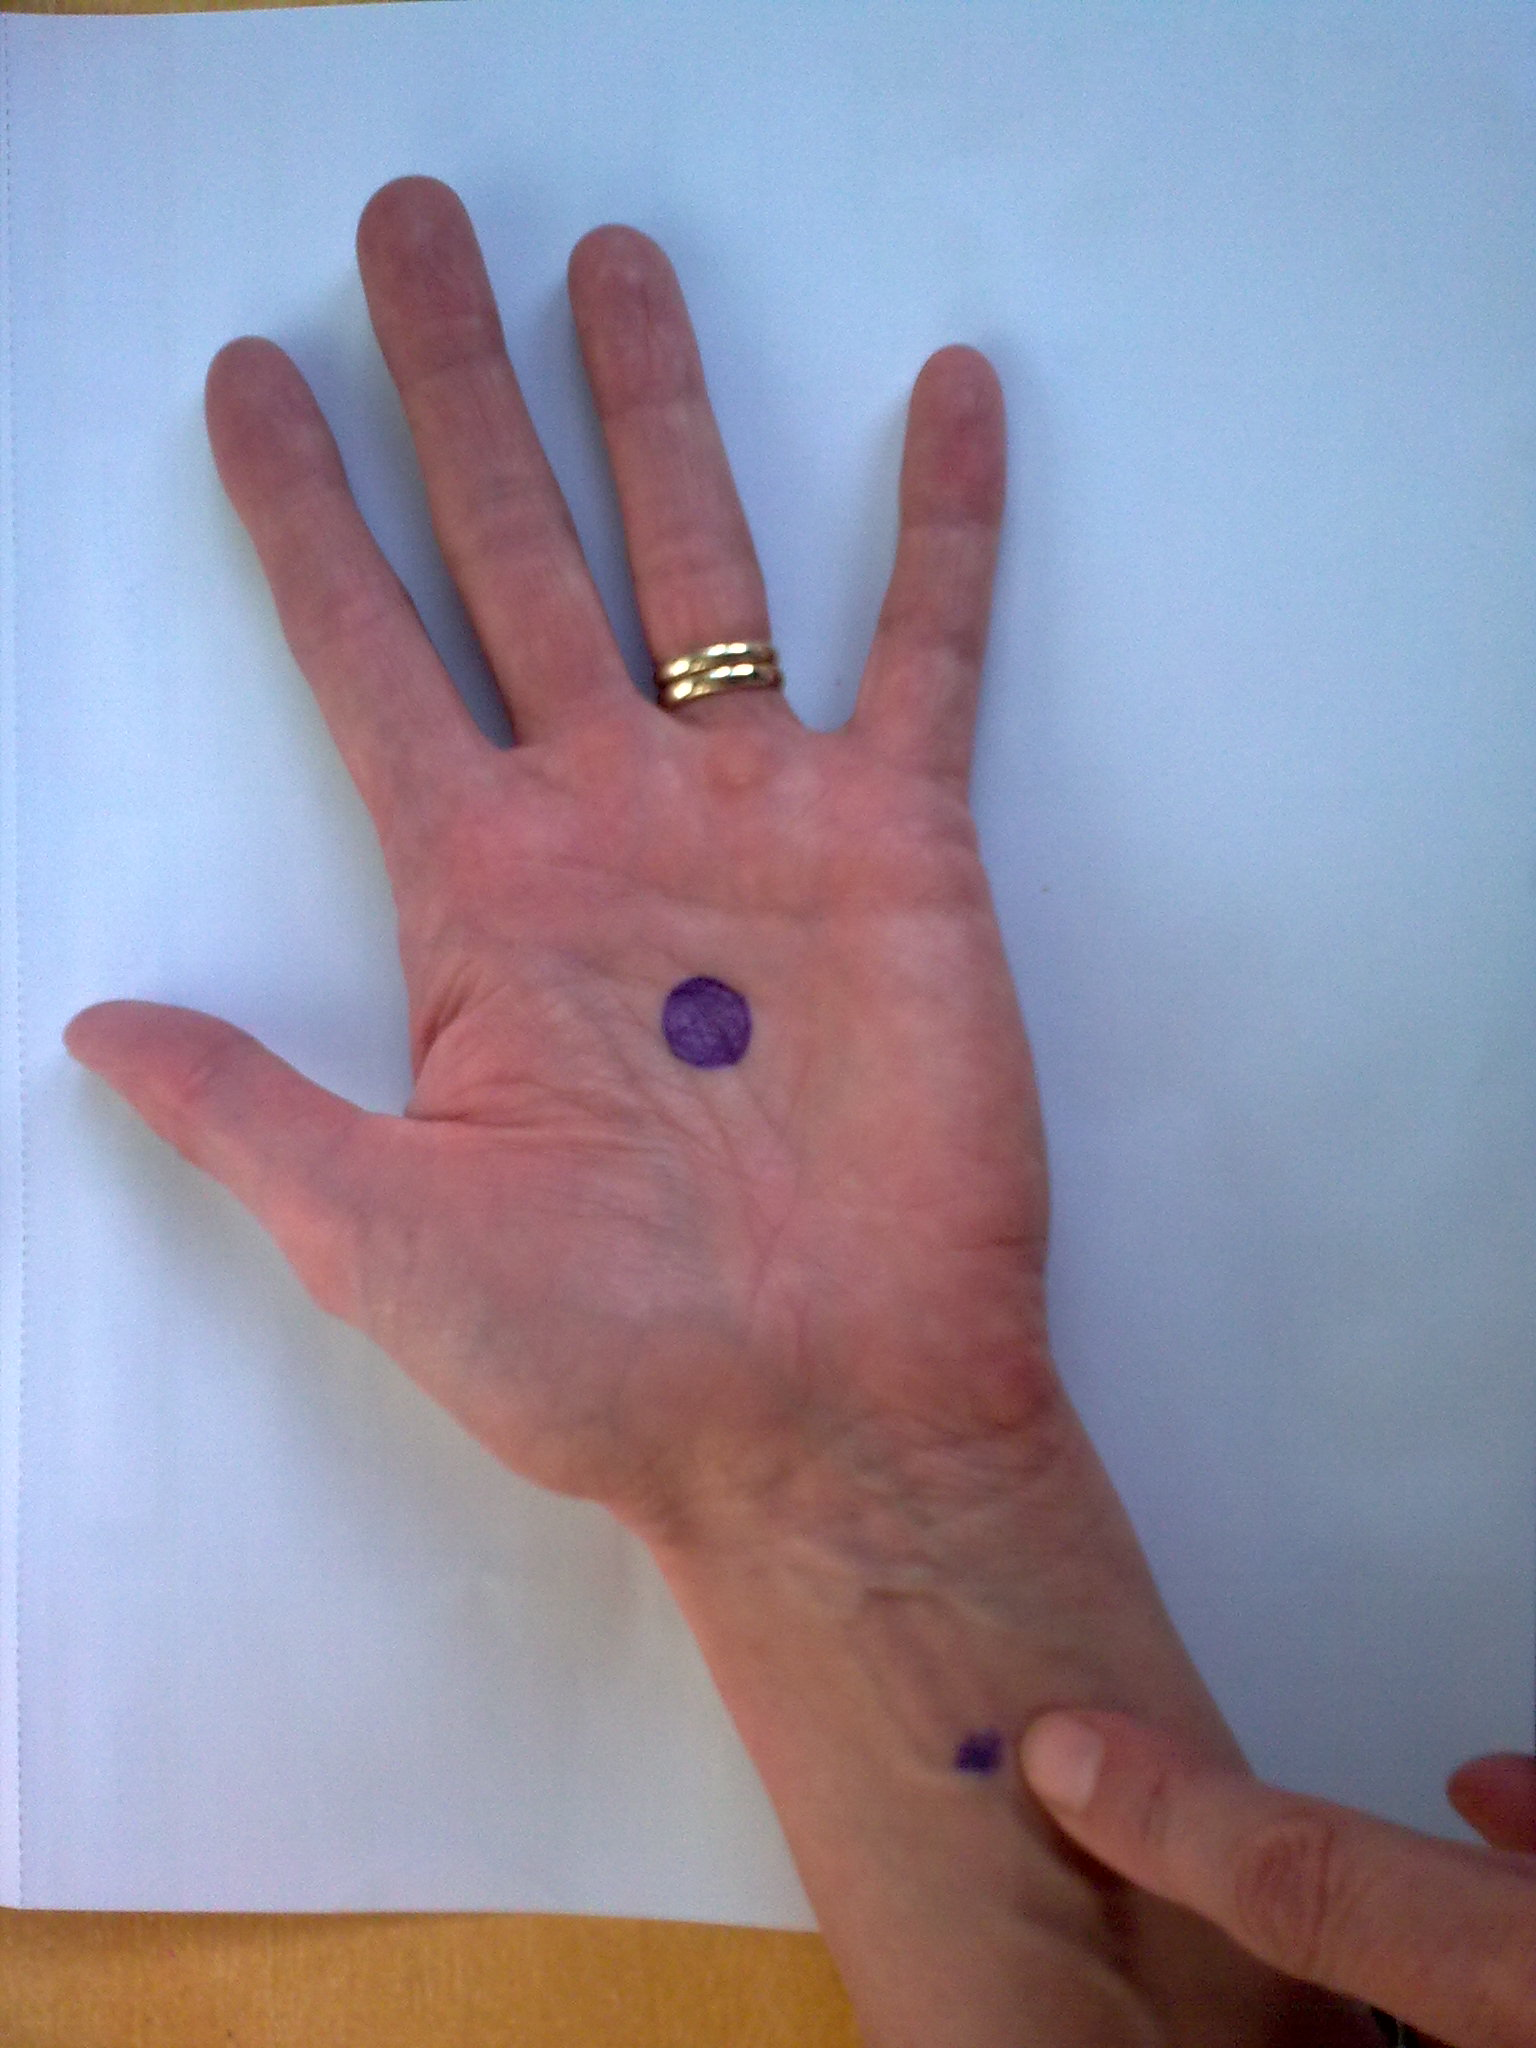 foto hartbeschermer/pericardium 6